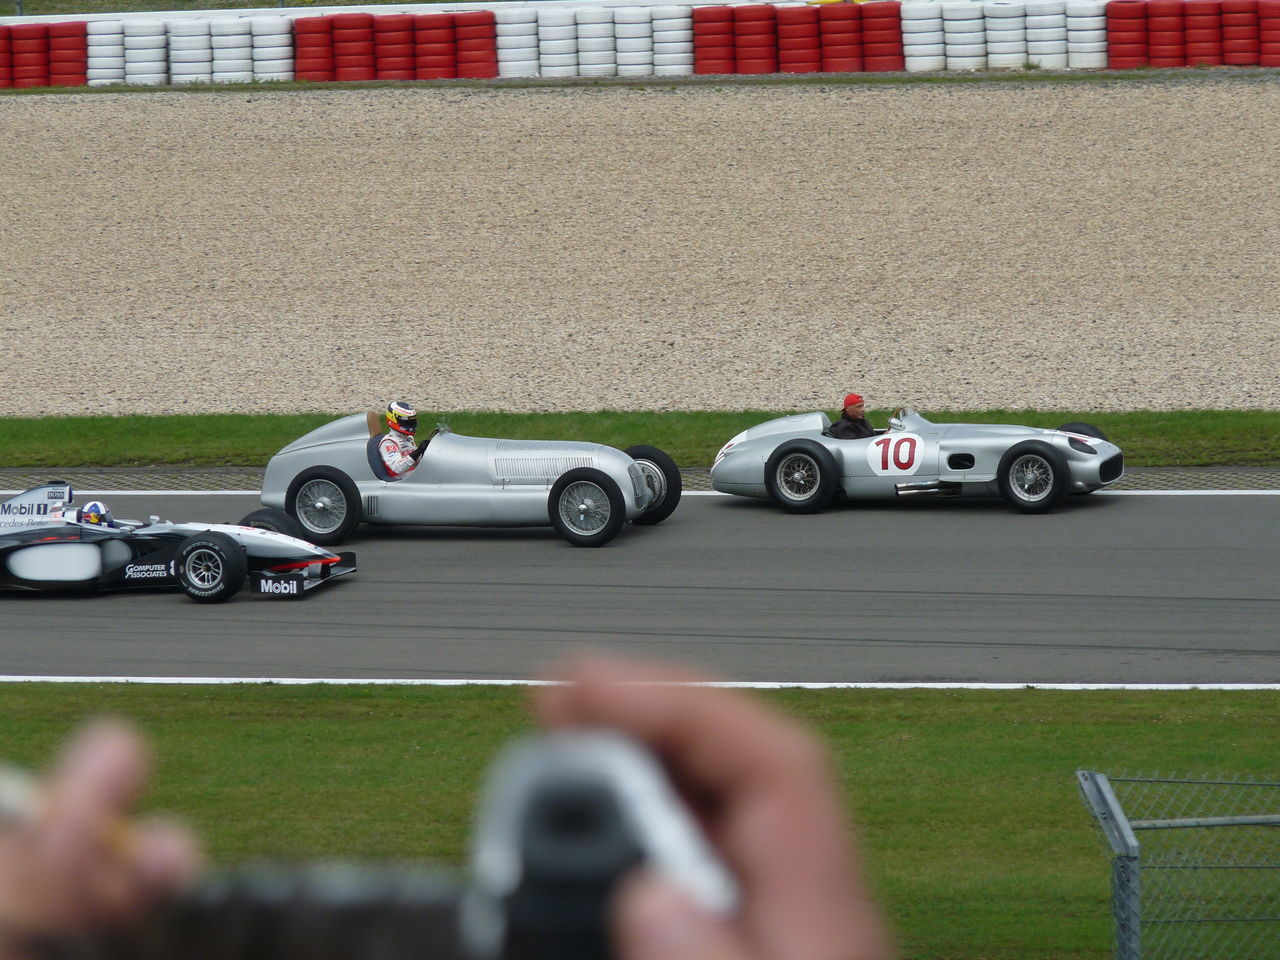 AMG Power Cool Deutschland Formel 1 Formel One Hello World Mercedes Motorsport PS Boliden Racing Car ViewNiki Lauda